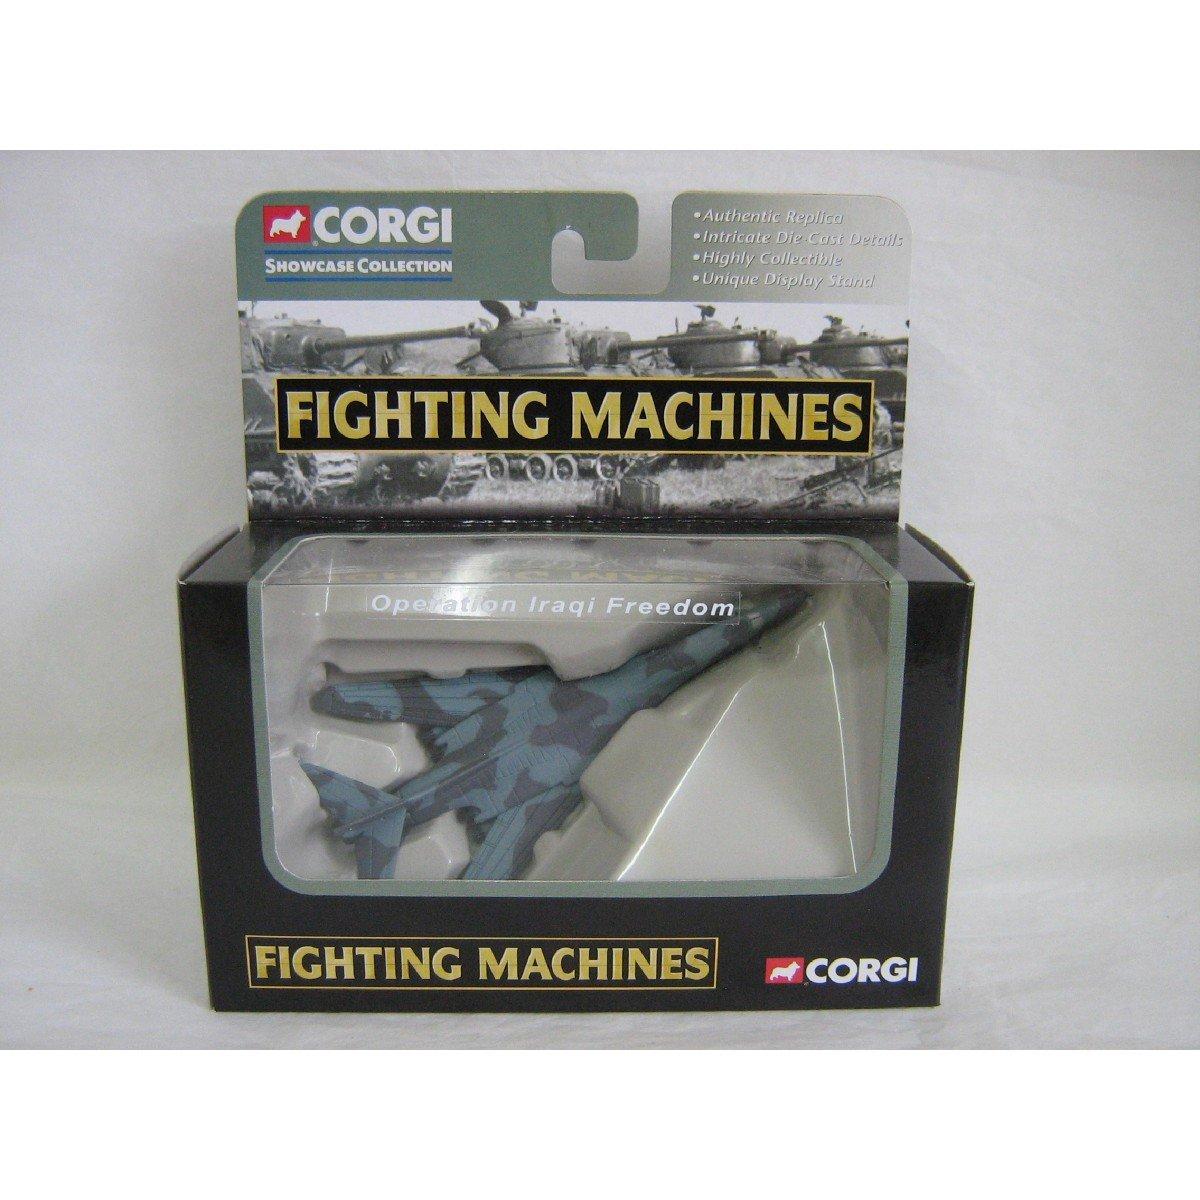 Corgi Fighting Machines: Operation Iraqi Freedom U.S. B-1 Diecast Plane, Classic Showcase Collection